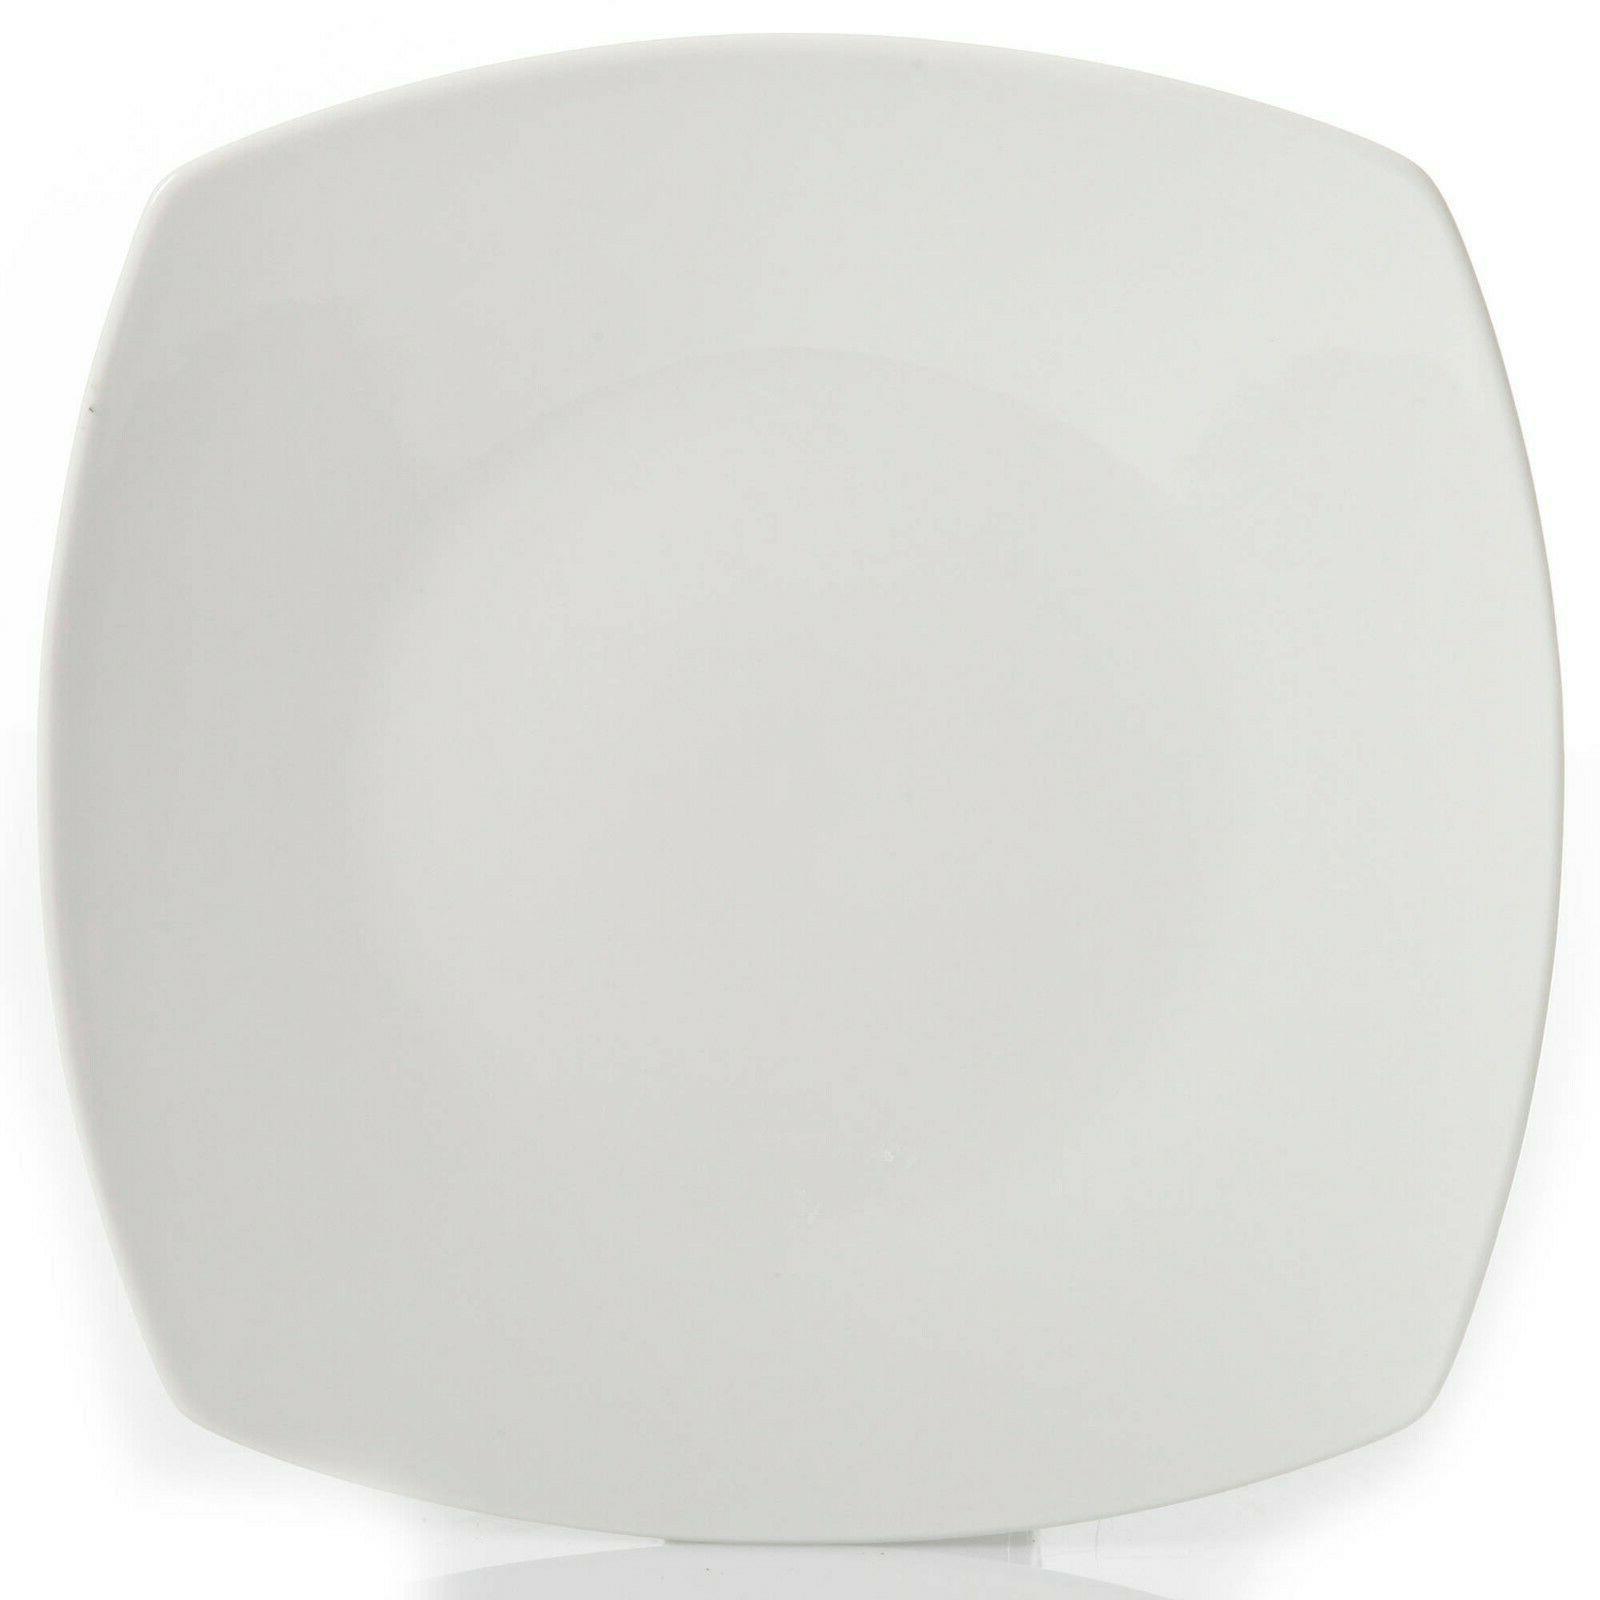 12-Piece Dinner Bowls Ceramic Dishes